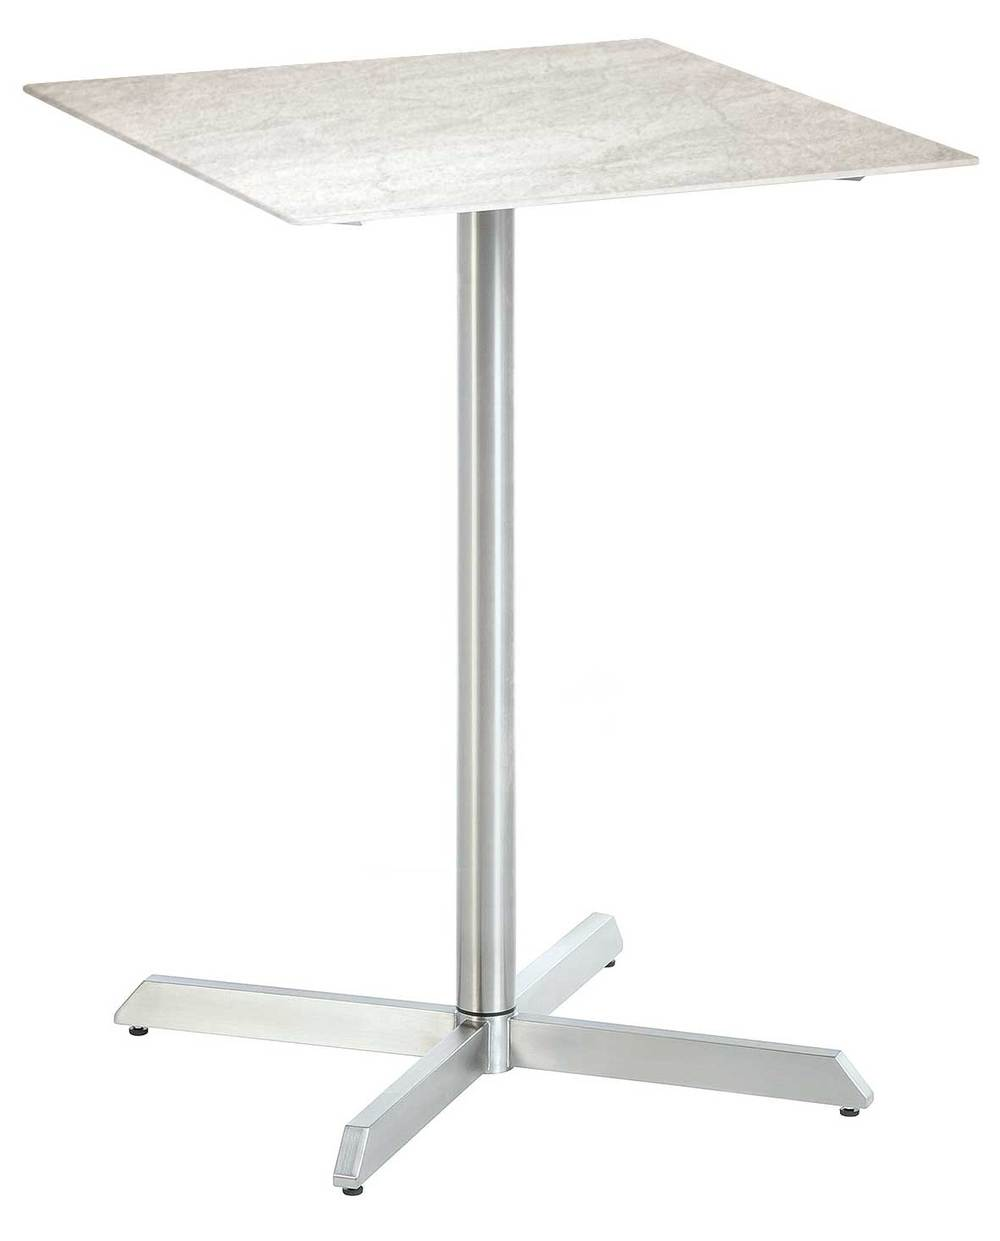 Barlow Tyrie - Equinox High Table/Ceramic Top